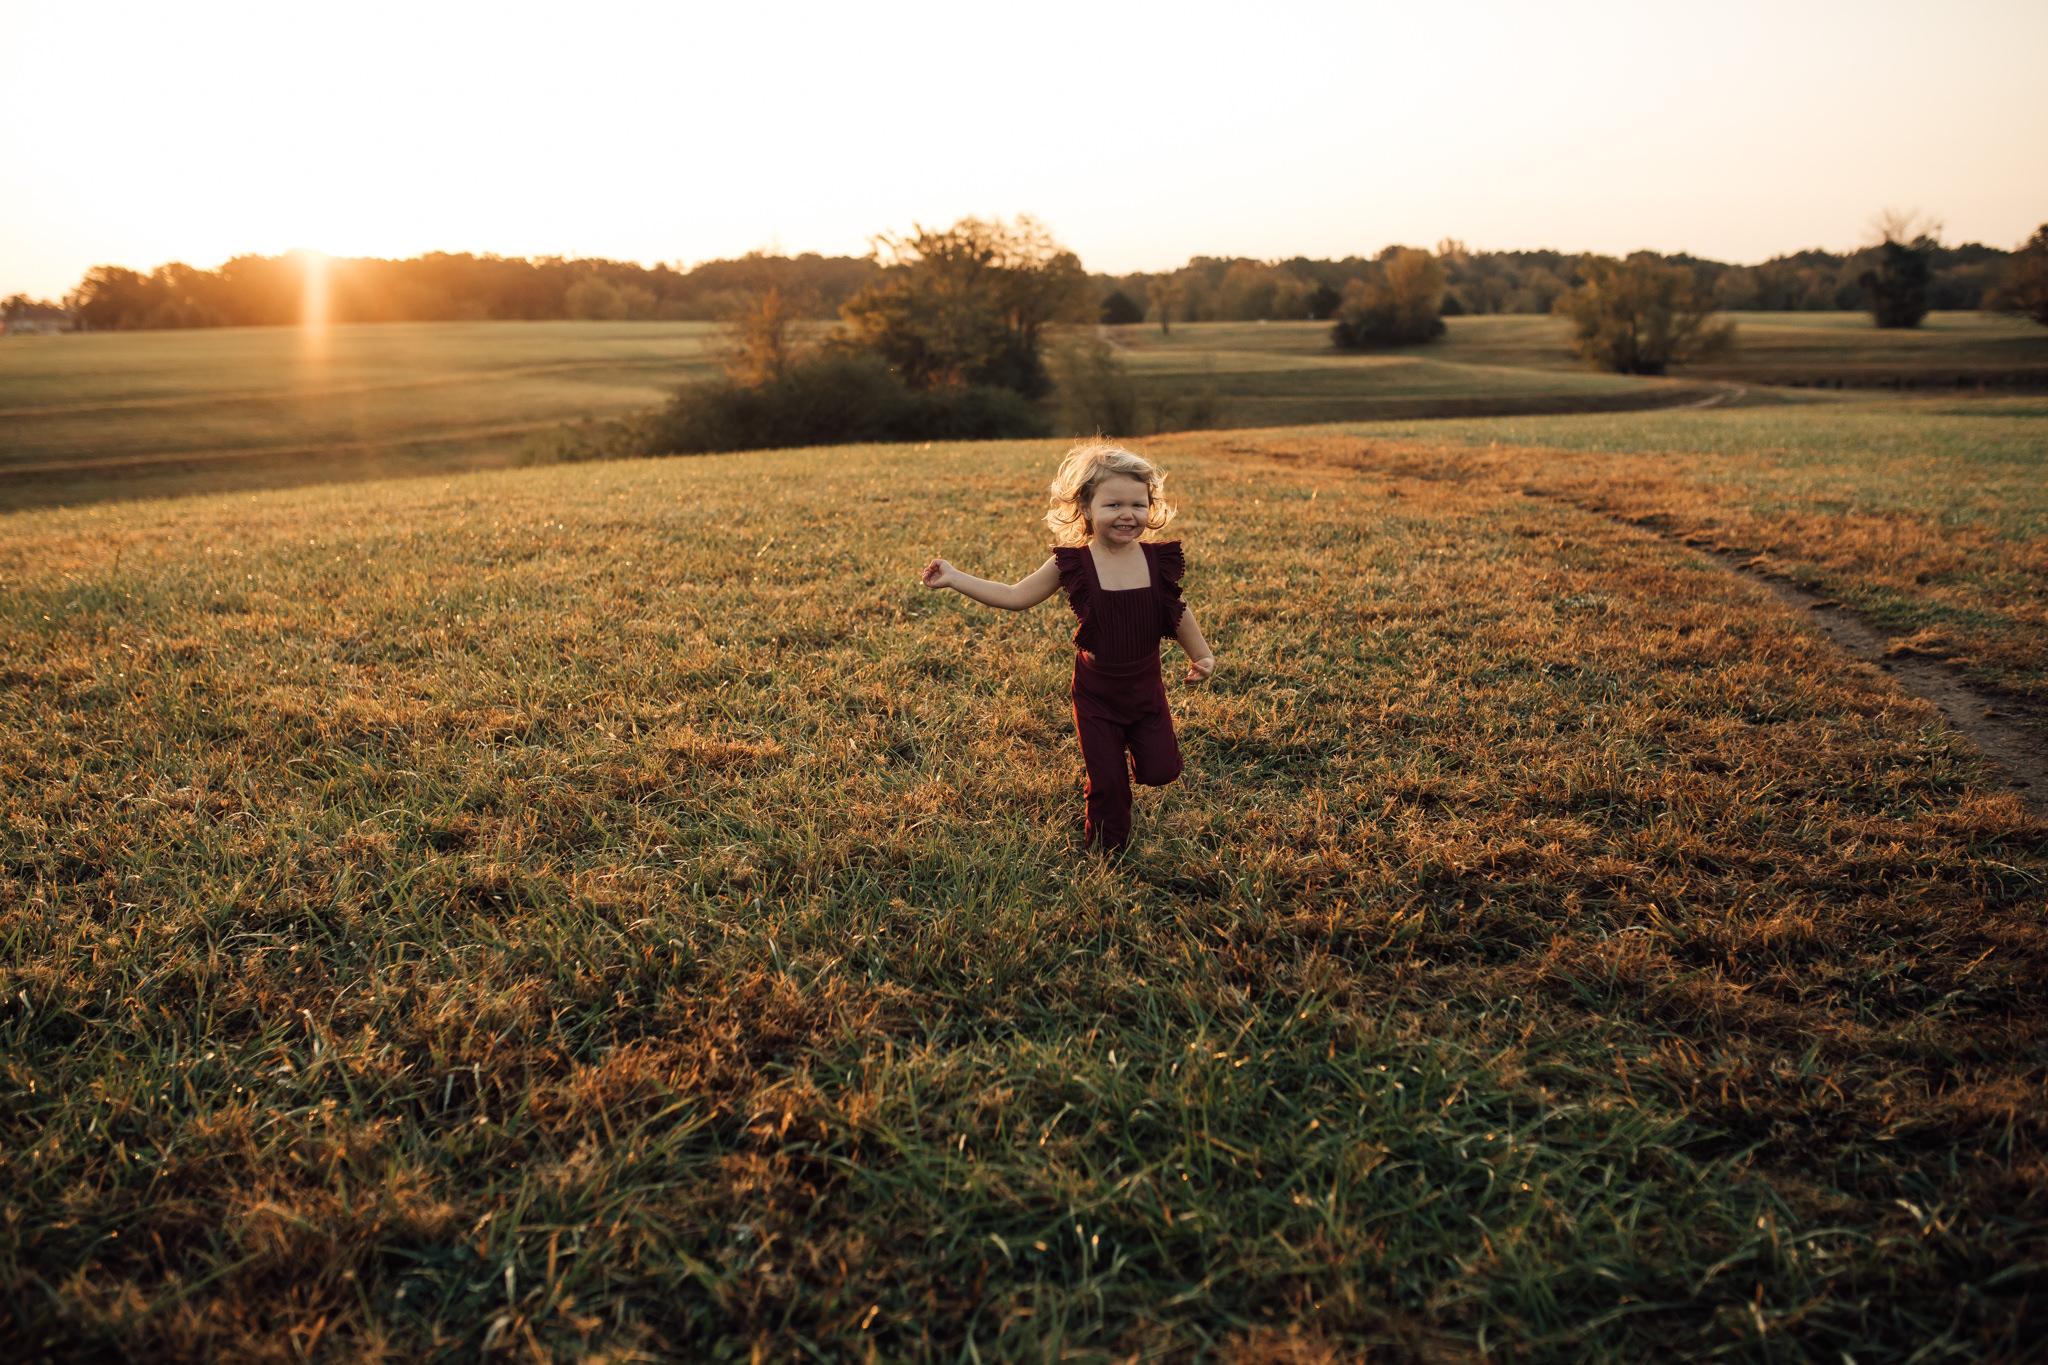 cassie-cook-photography-memphis-family-photographer-lifestyle-family-photographer-sunrise-gray-family-22.jpg